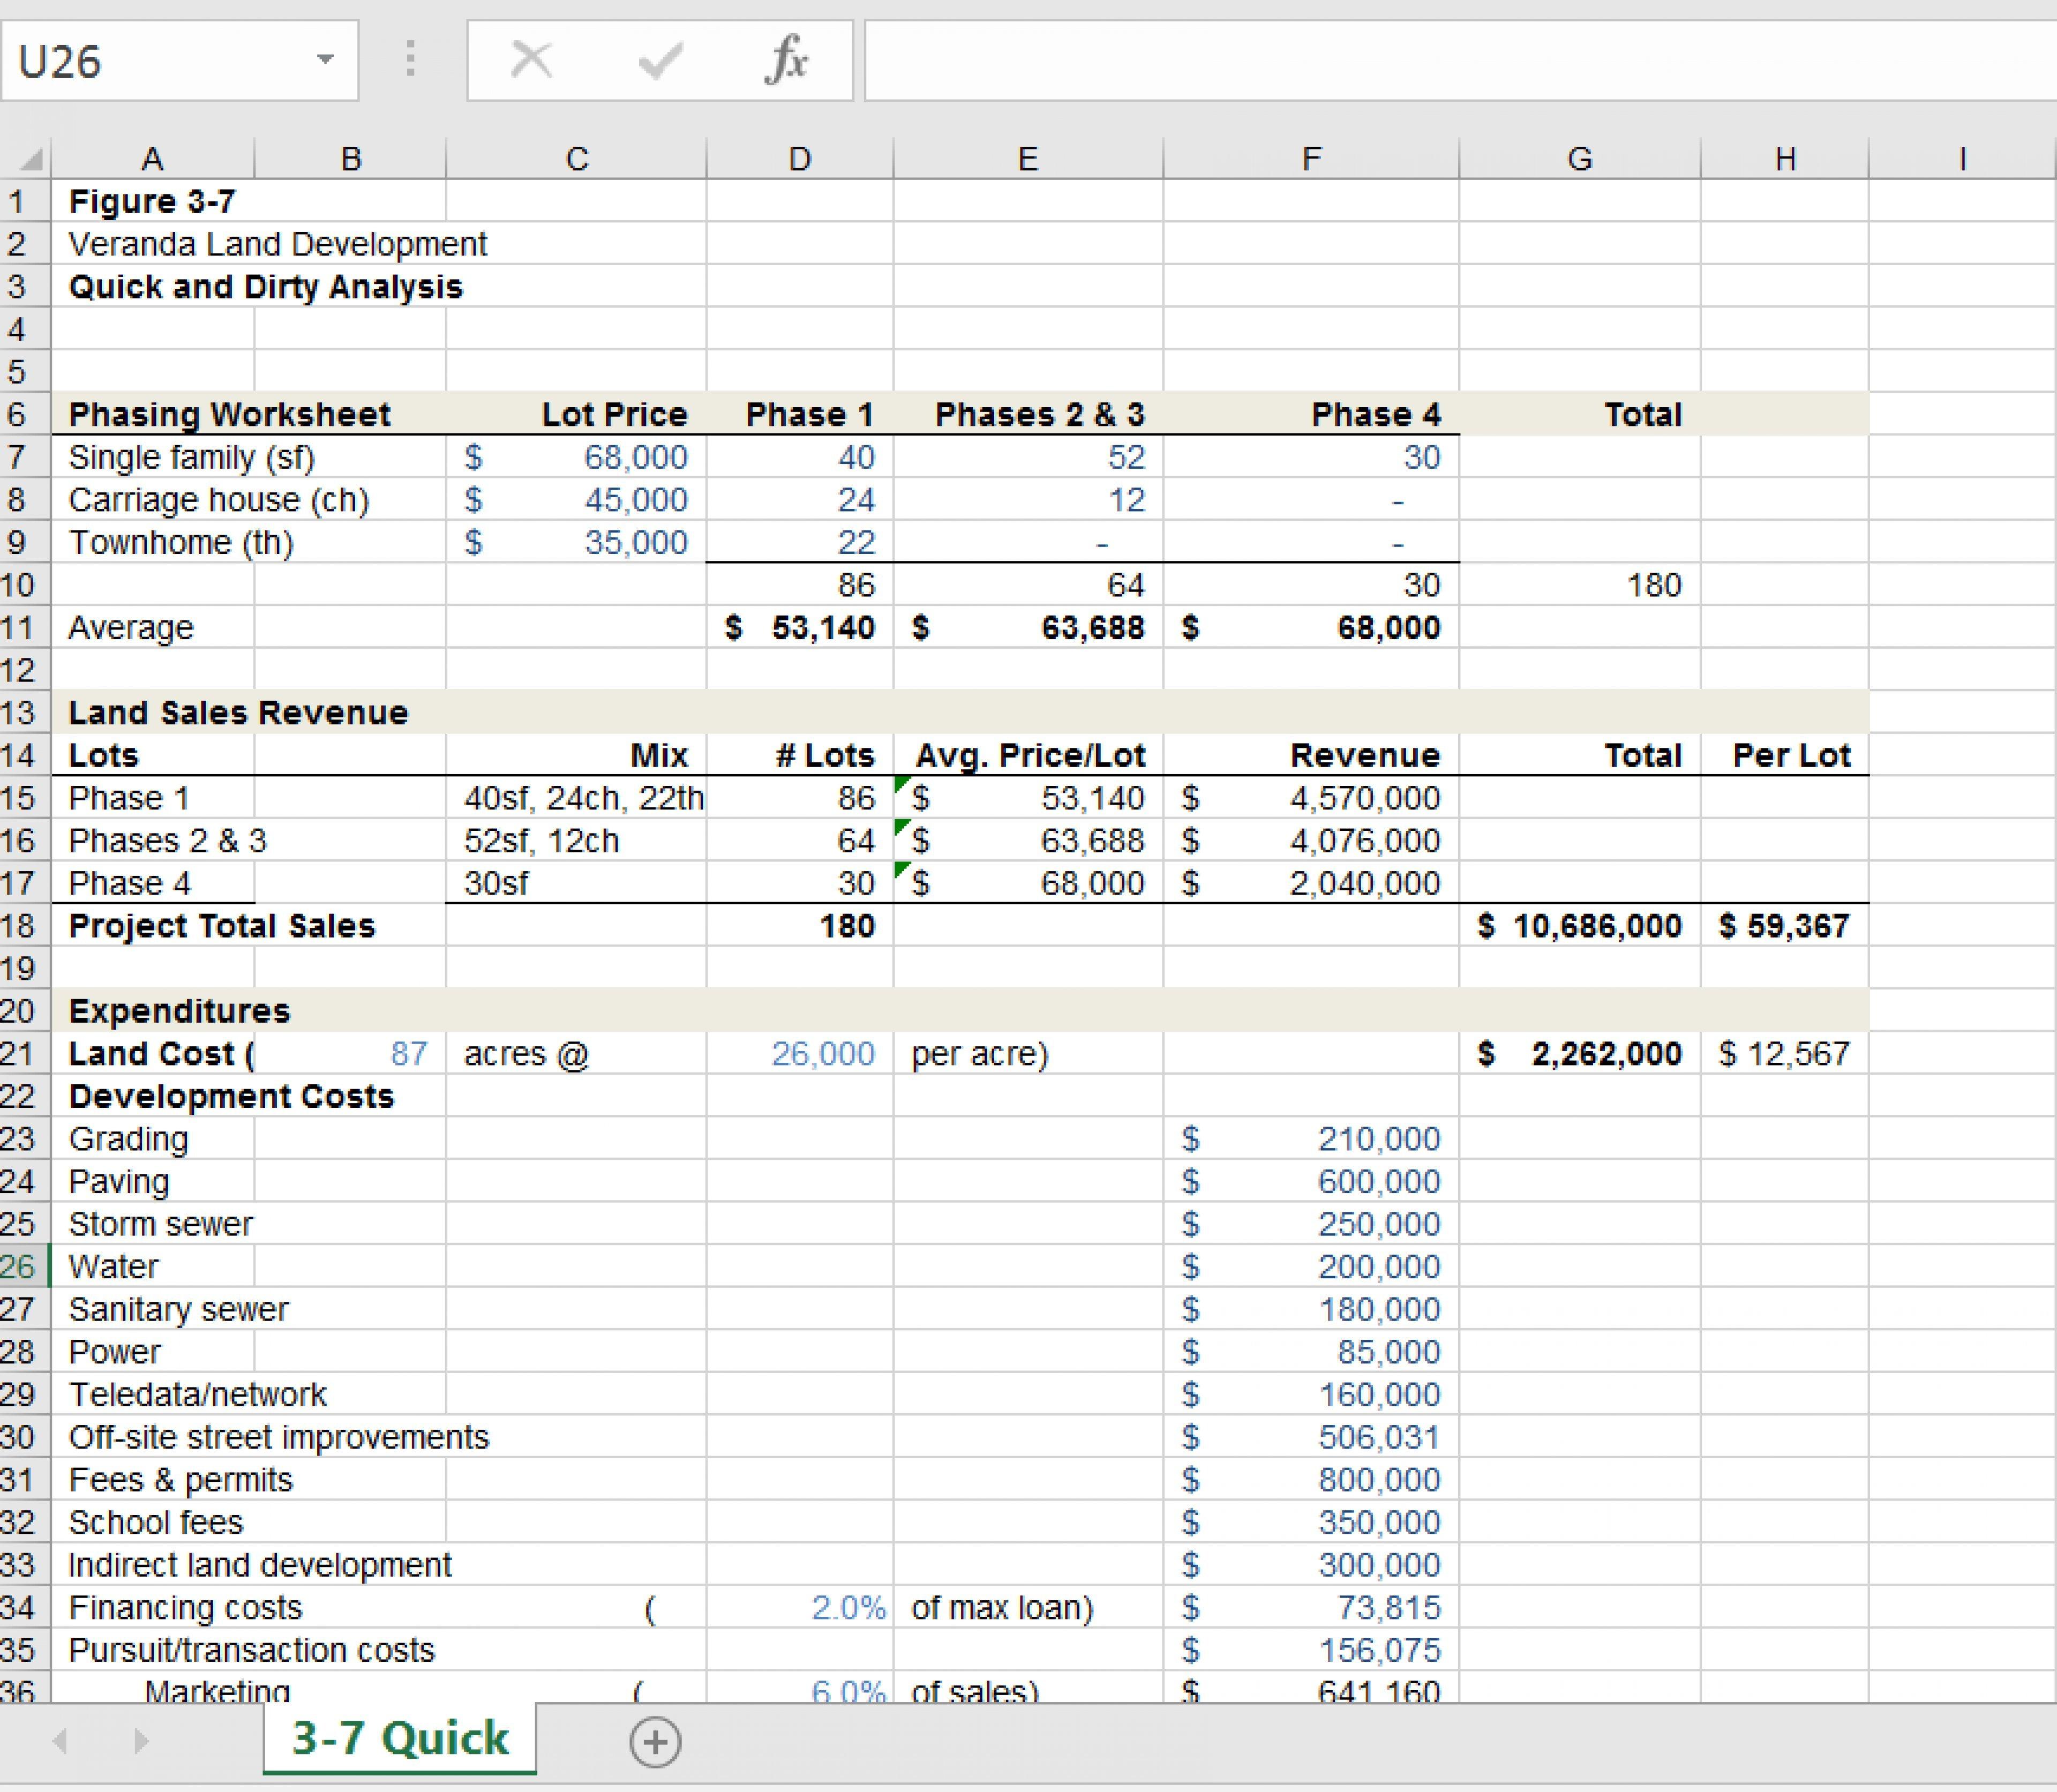 Real Estate Professional Developer's Excel Tool Kit Template - Eloquens Regarding Real Estate Development Spreadsheet